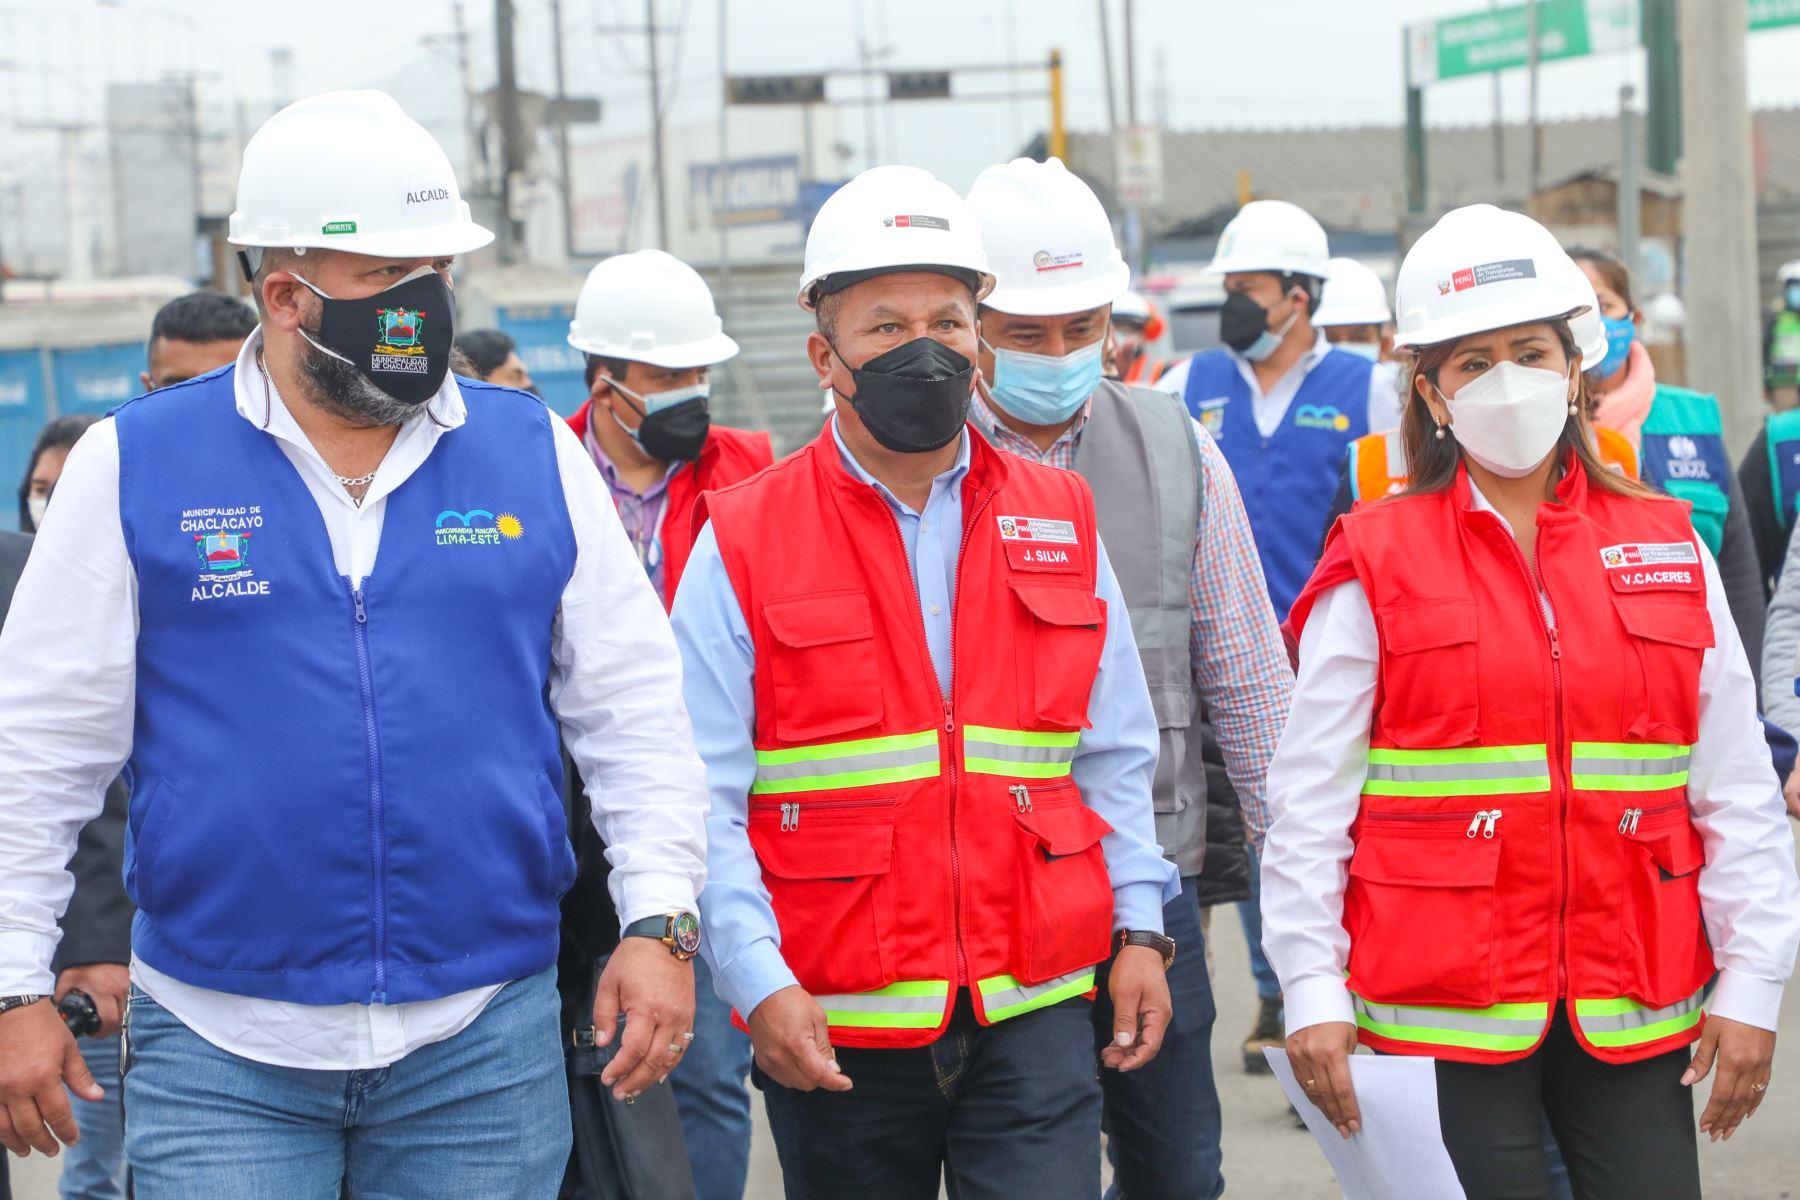 Ministro Juan Francisco Silva Villegas lideró comitiva integrada por la ATU, la Municipalidad Metropolitana de Lima y alcaldes de la Mancomunidad Lima Este. Foto: MTC